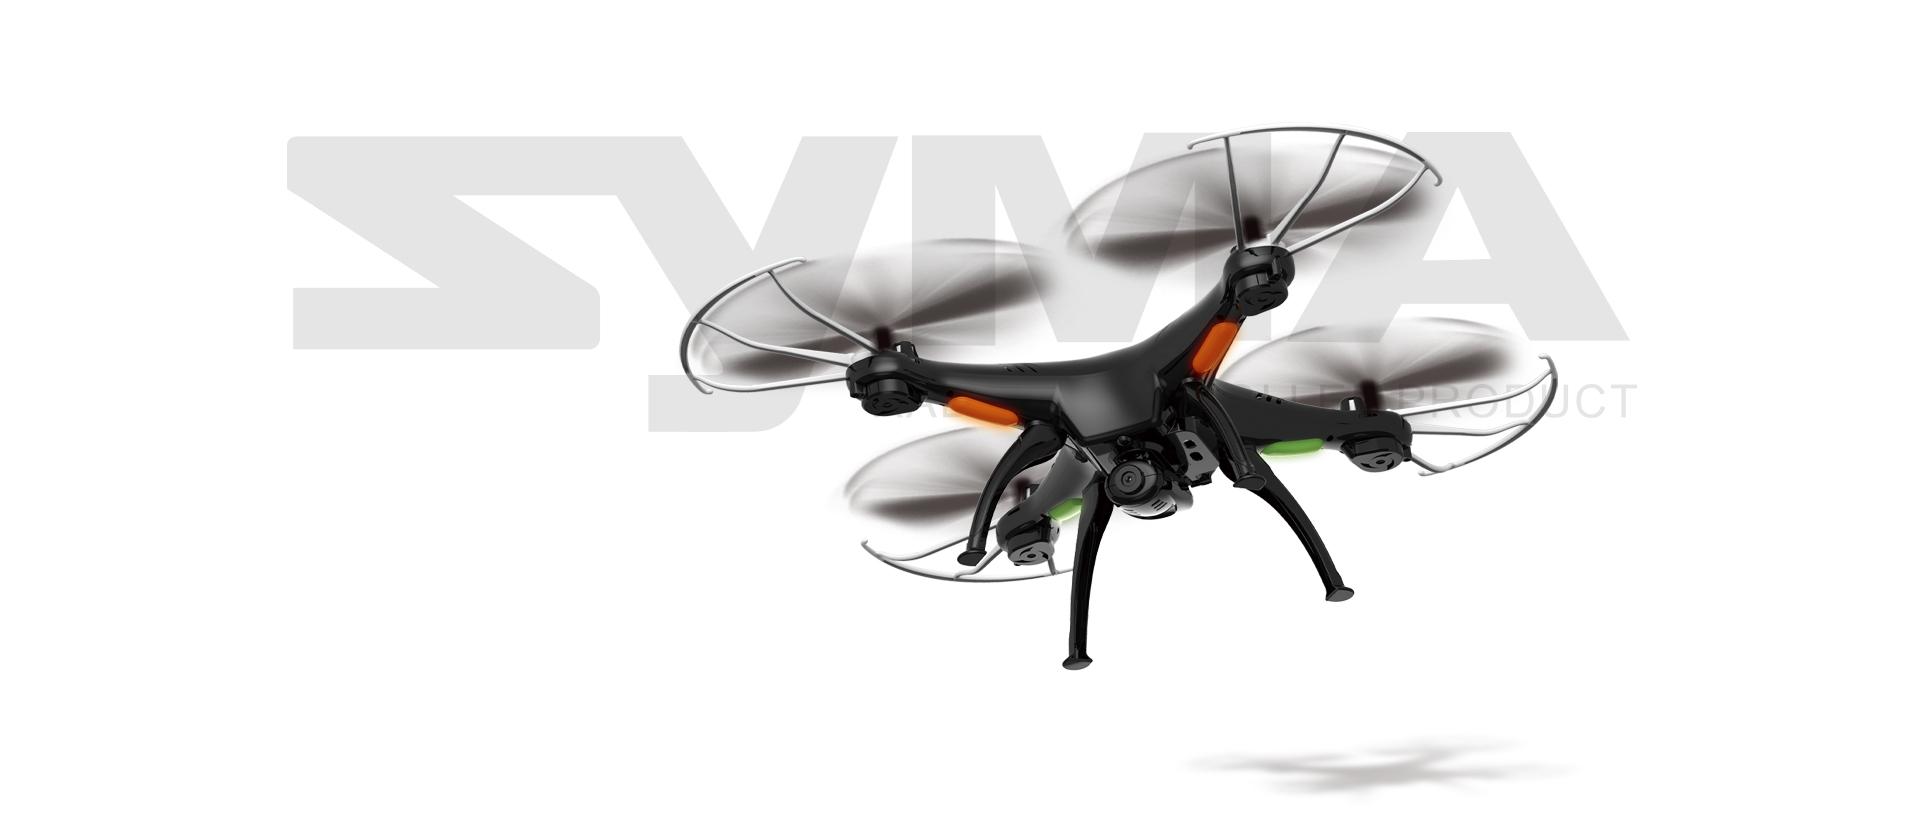 Syma X5sw Rc Wi Fi Fpv Drone